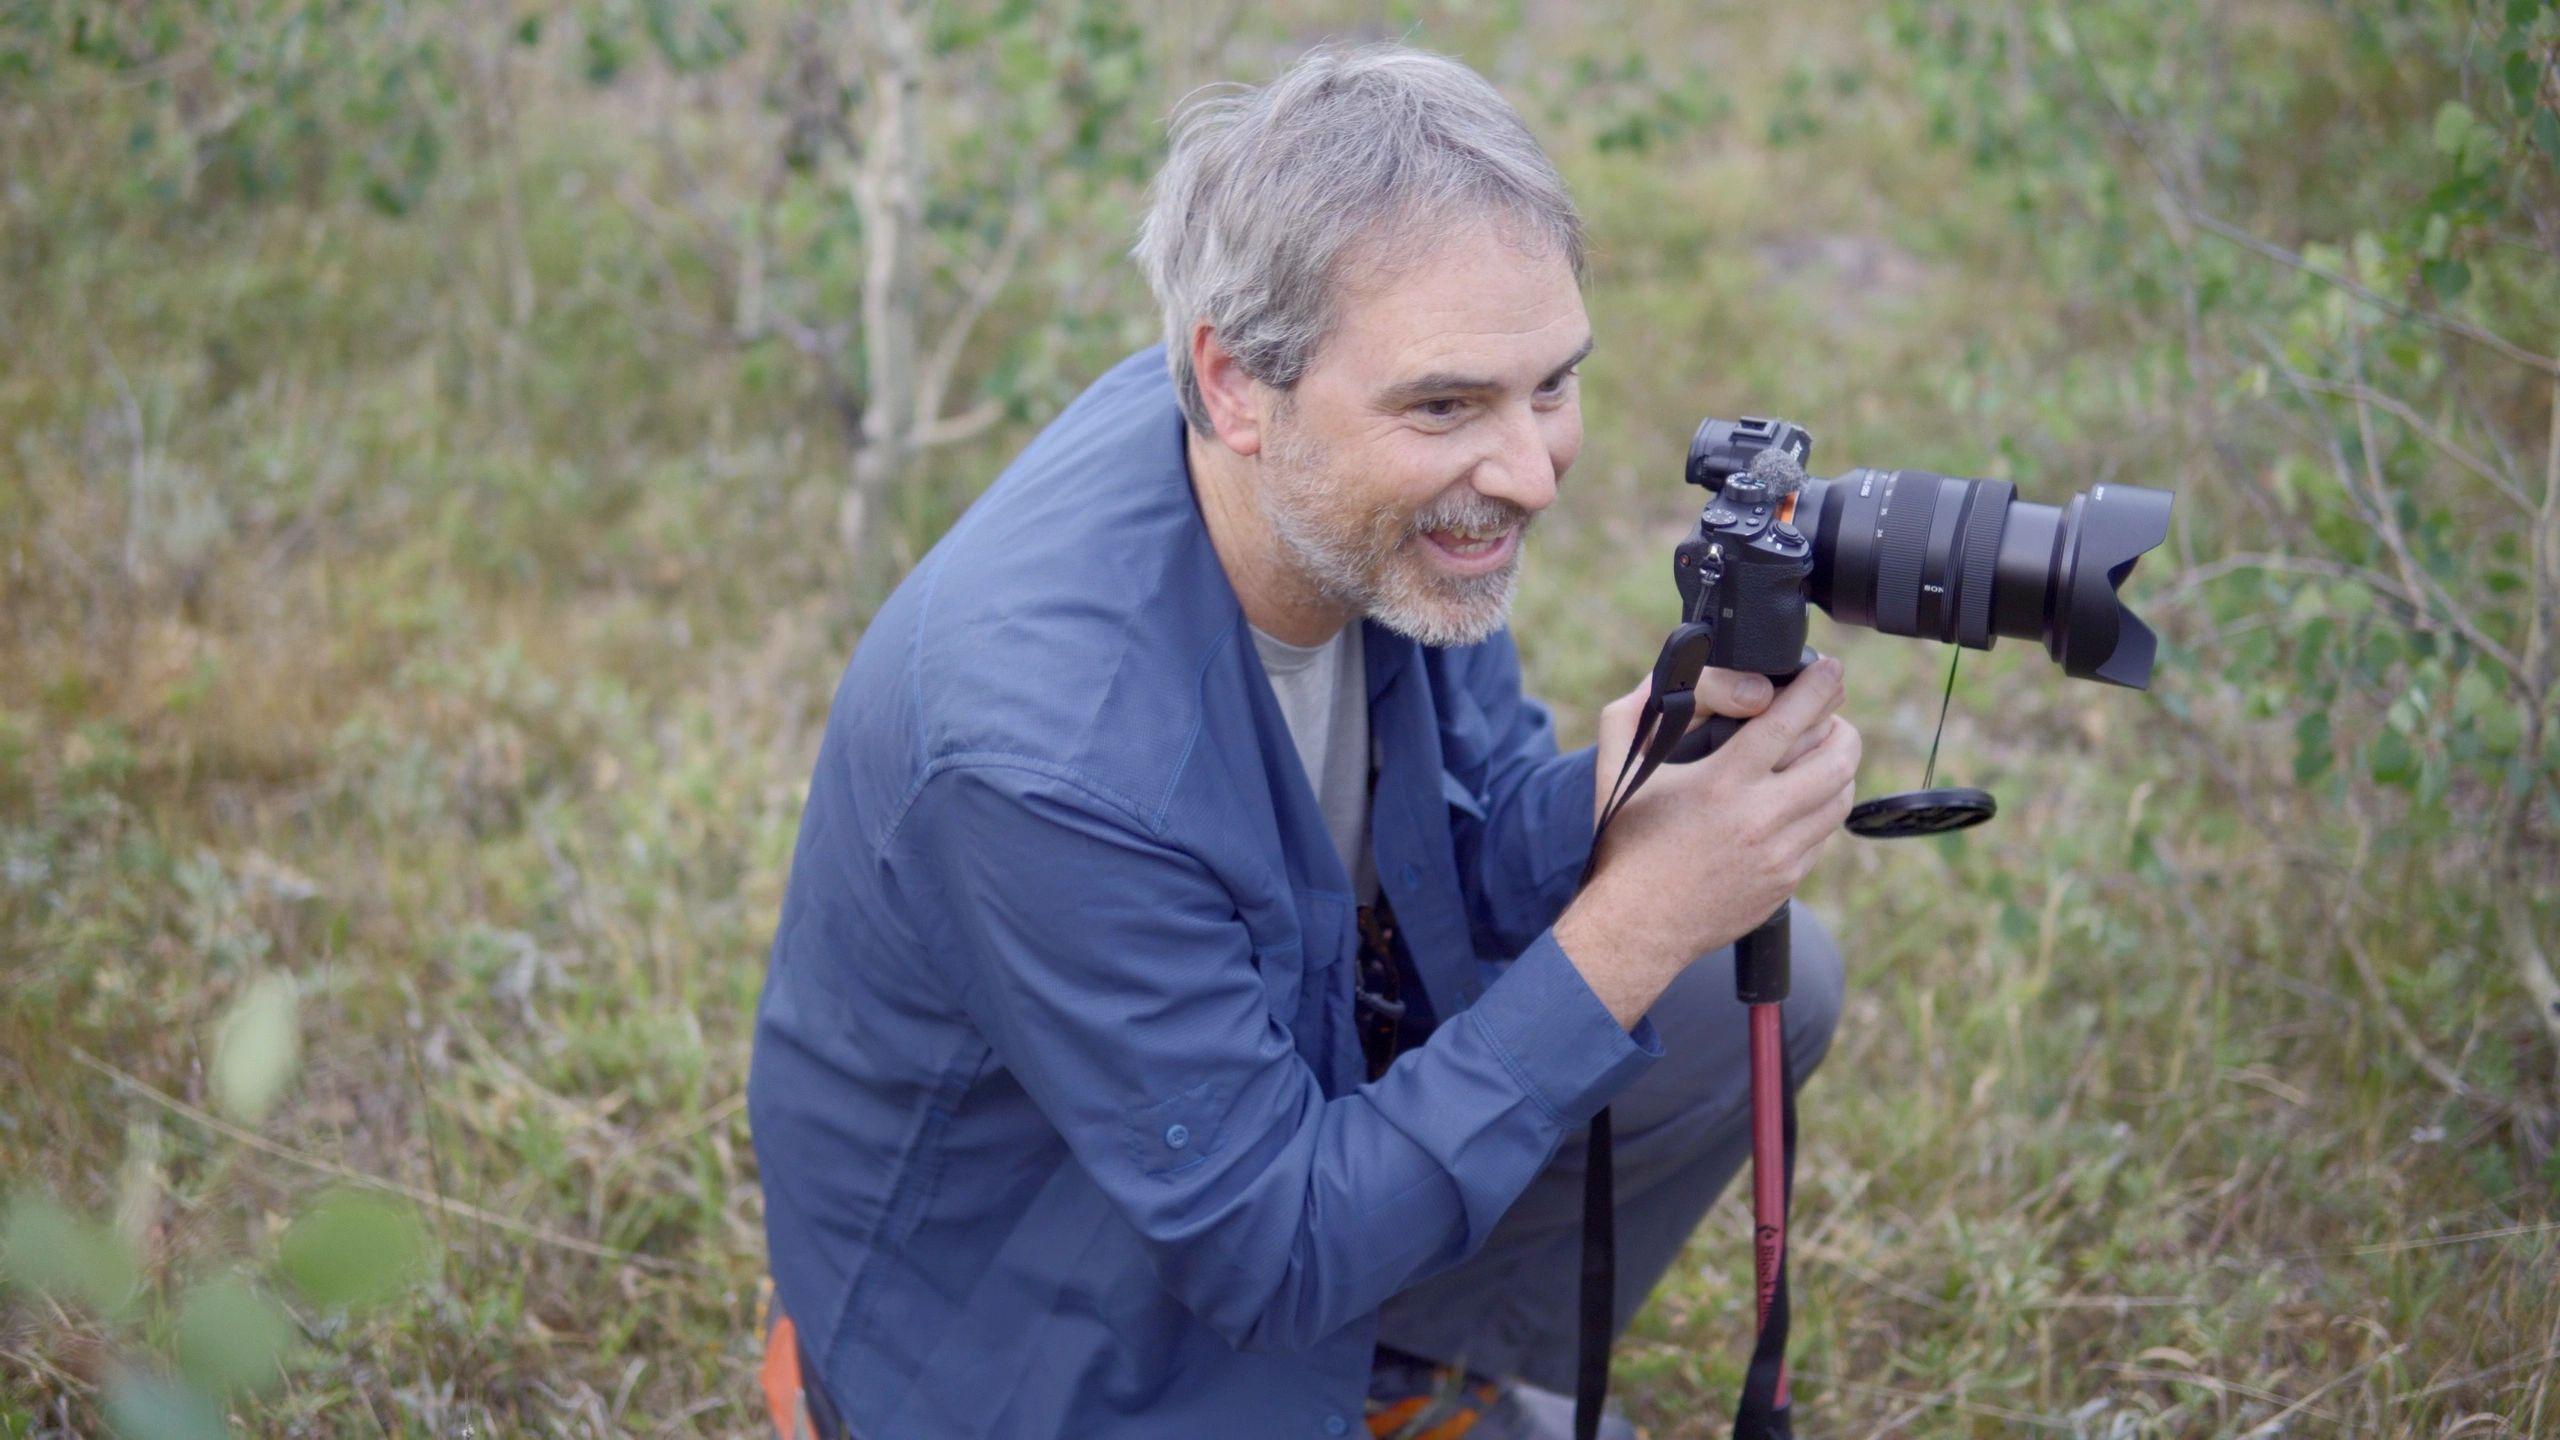 Gordon Gurley